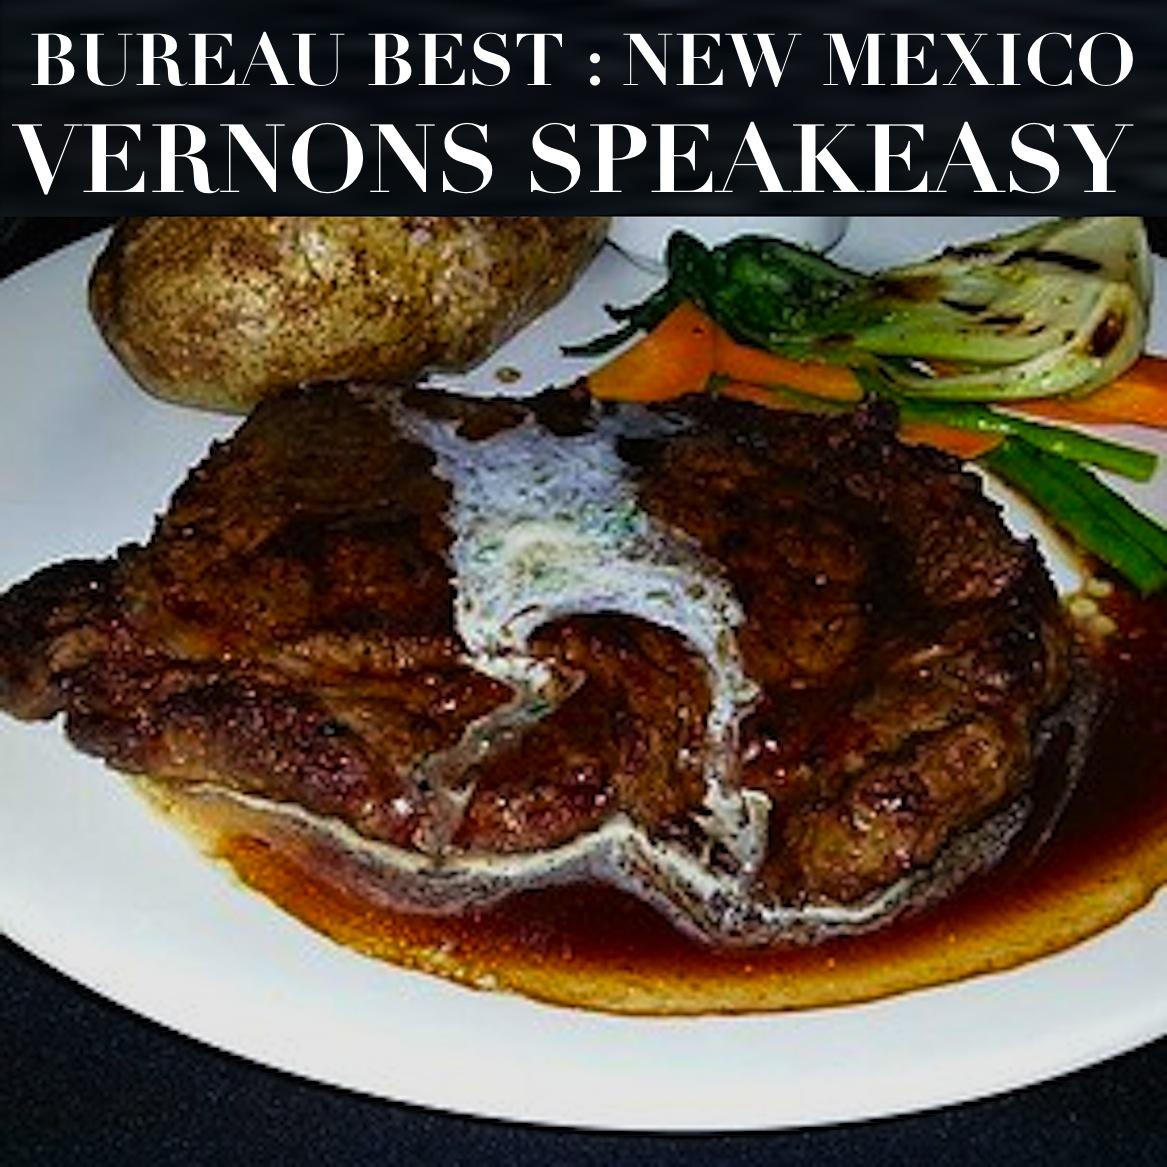 BUREAU BEST: NEW MEXICO